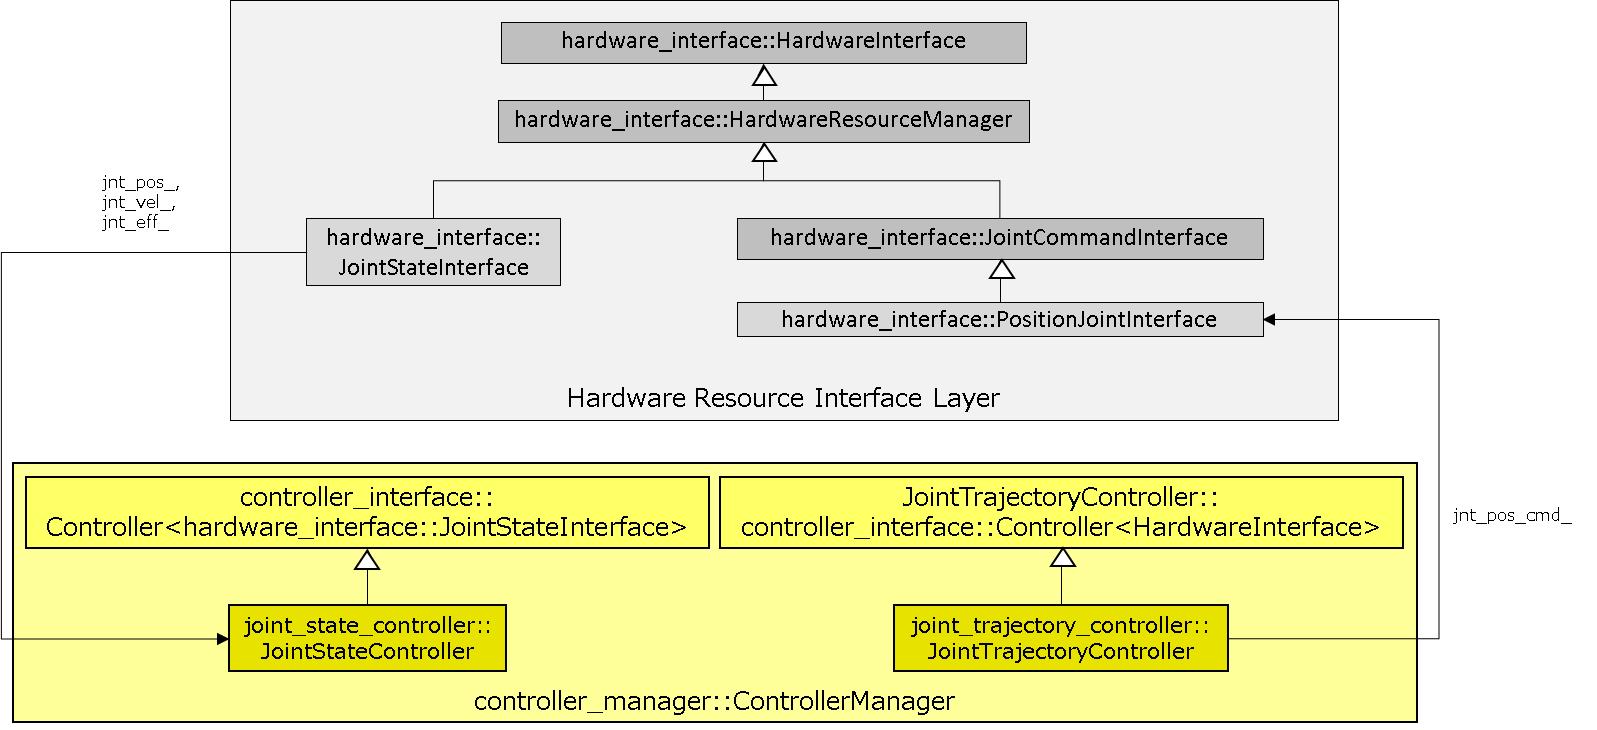 HardwareInterface_ControllerManager.png